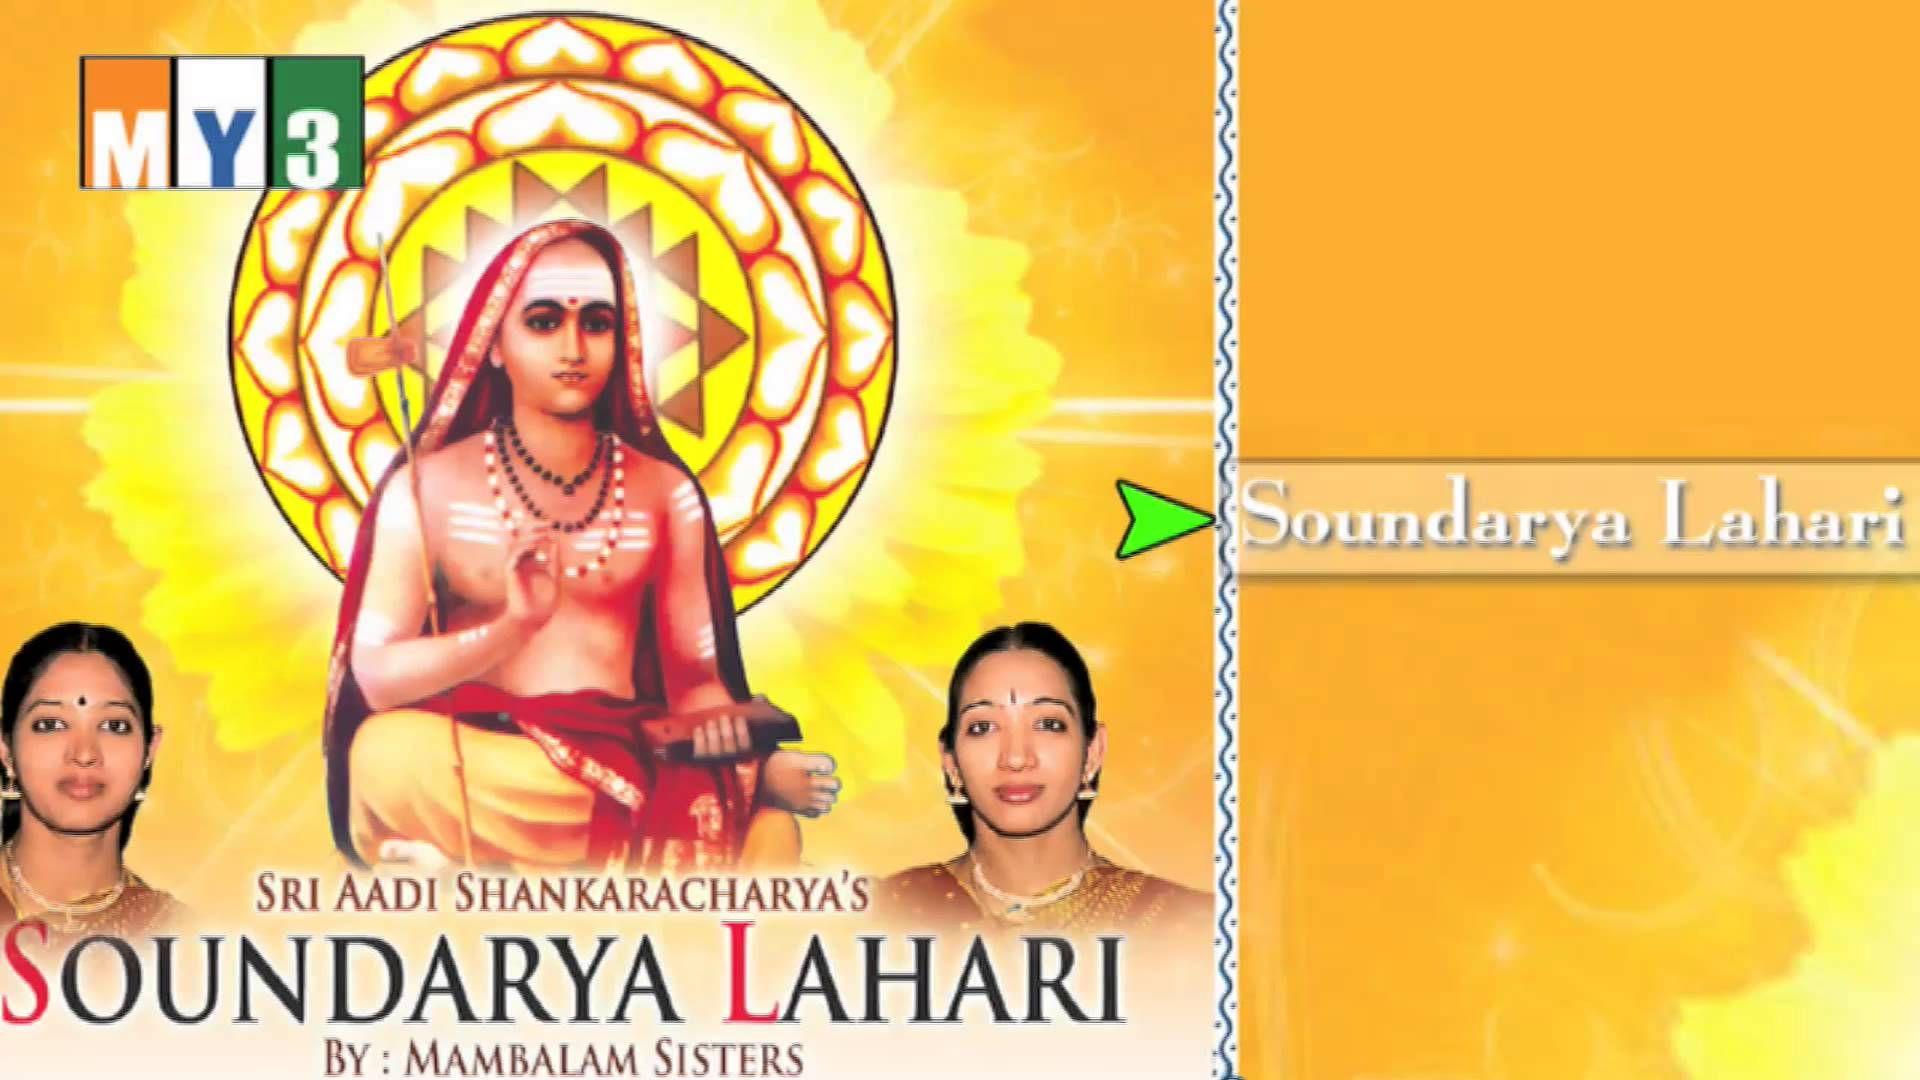 Soundarya Lahari Adi Shankara Mambalam Sisters Bhakthi